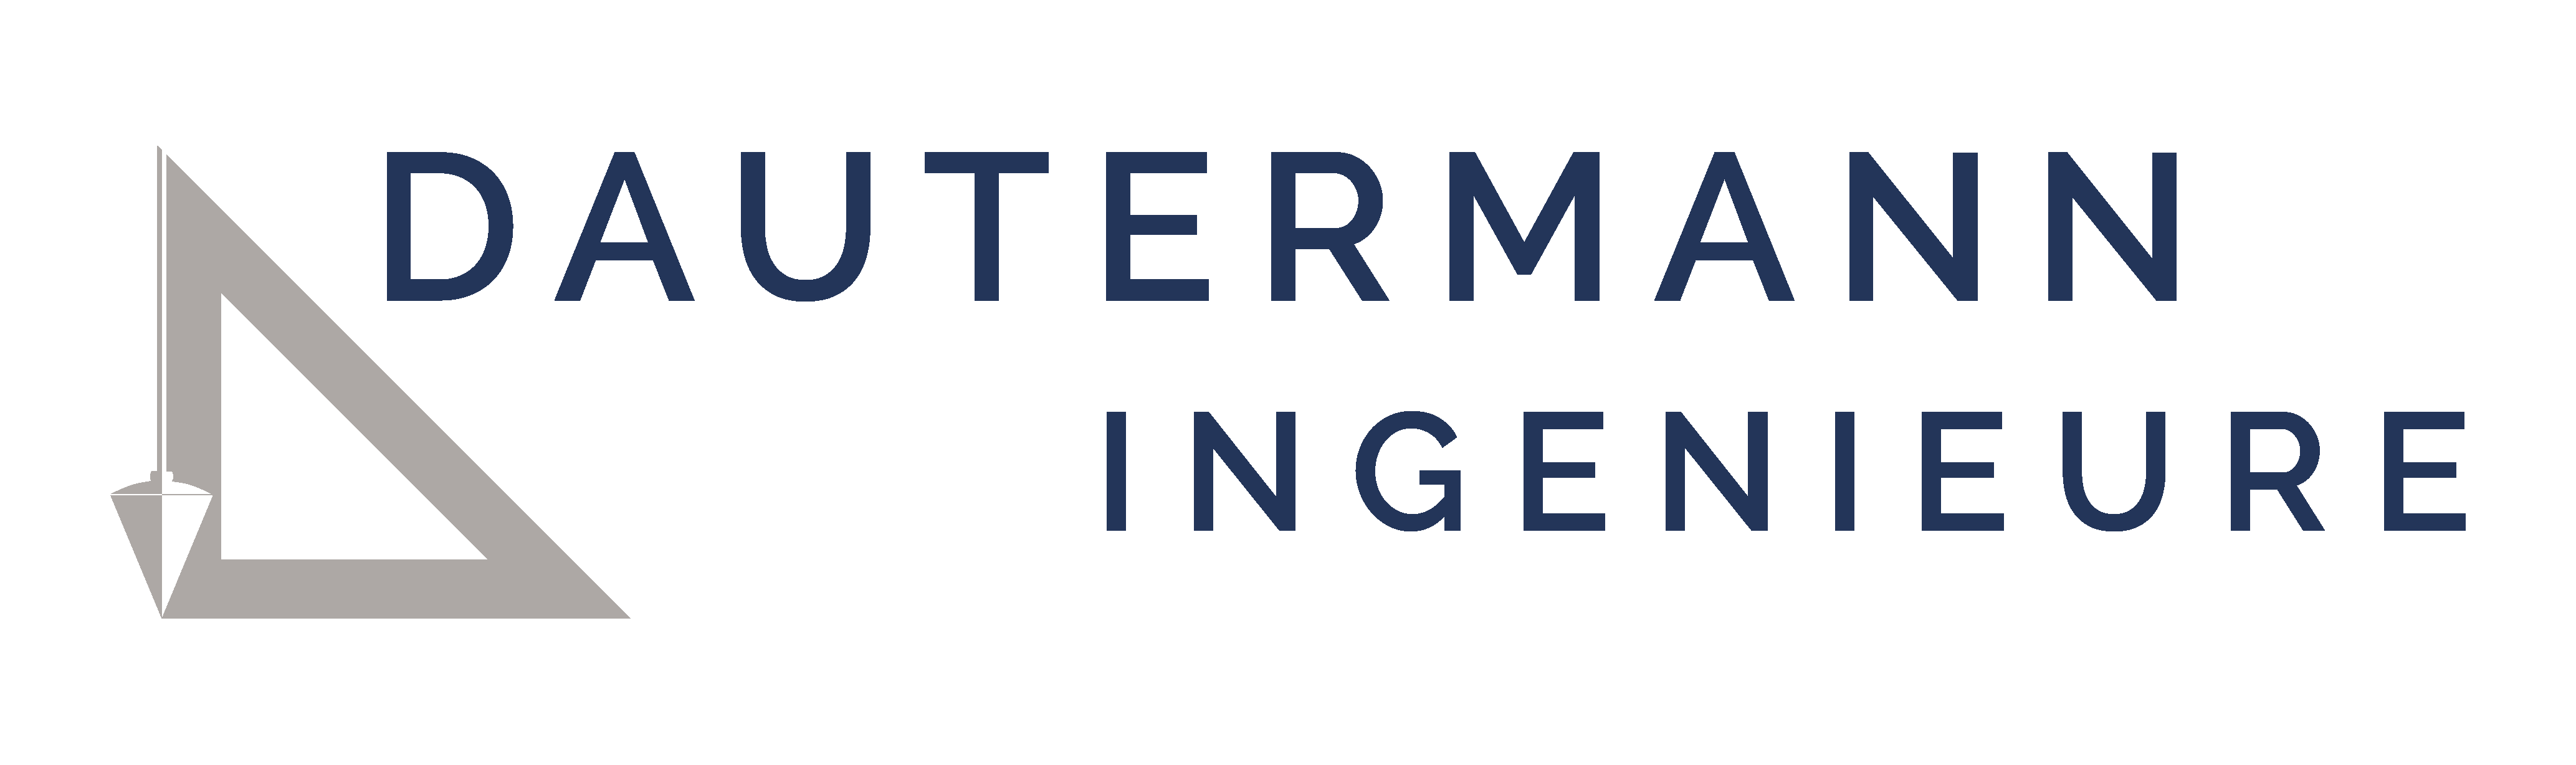 DAUTERMANN INGENIEURE GmbH